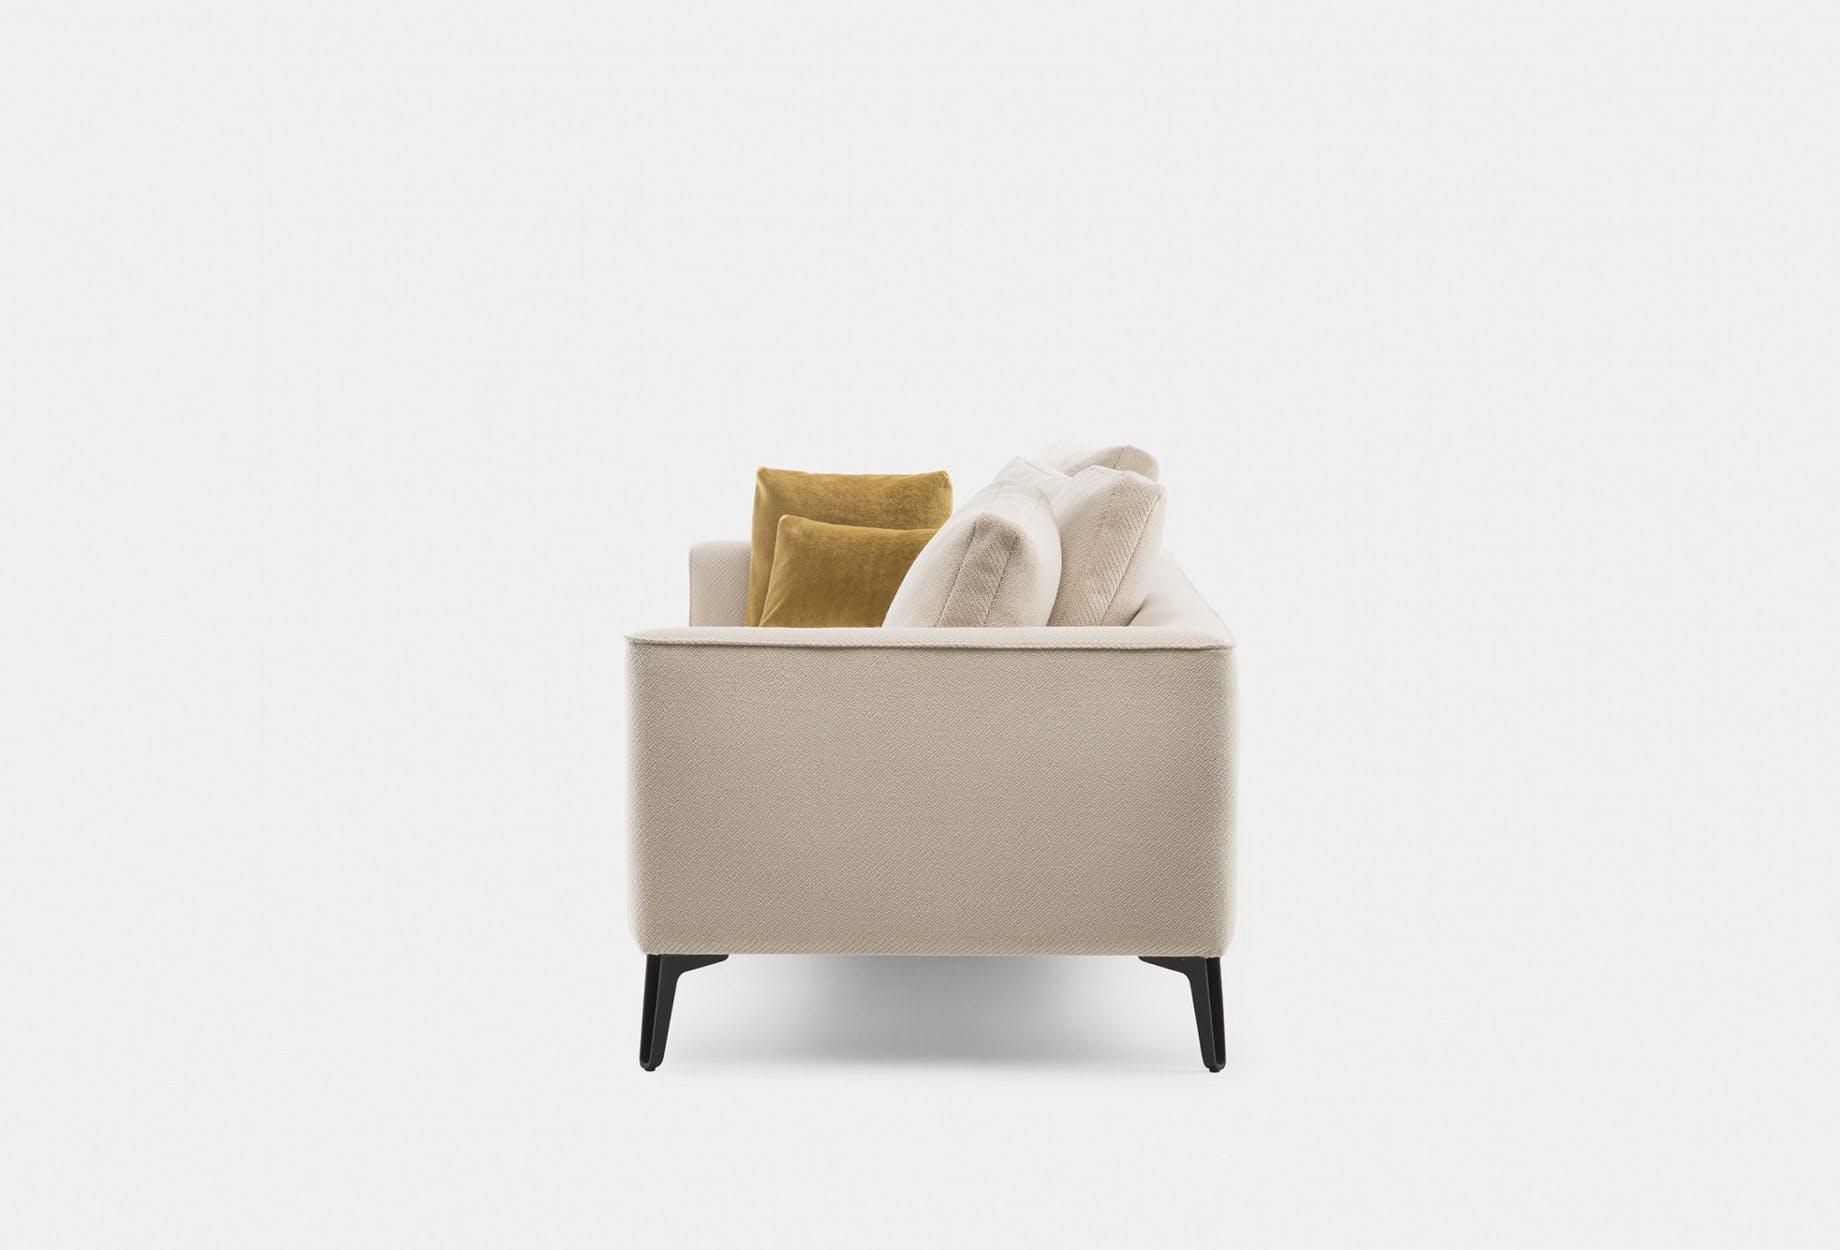 401 Mc Queen Sofa By Matthew Hilton In Coda 2 422 Fabric  Side2Web 1840X1250